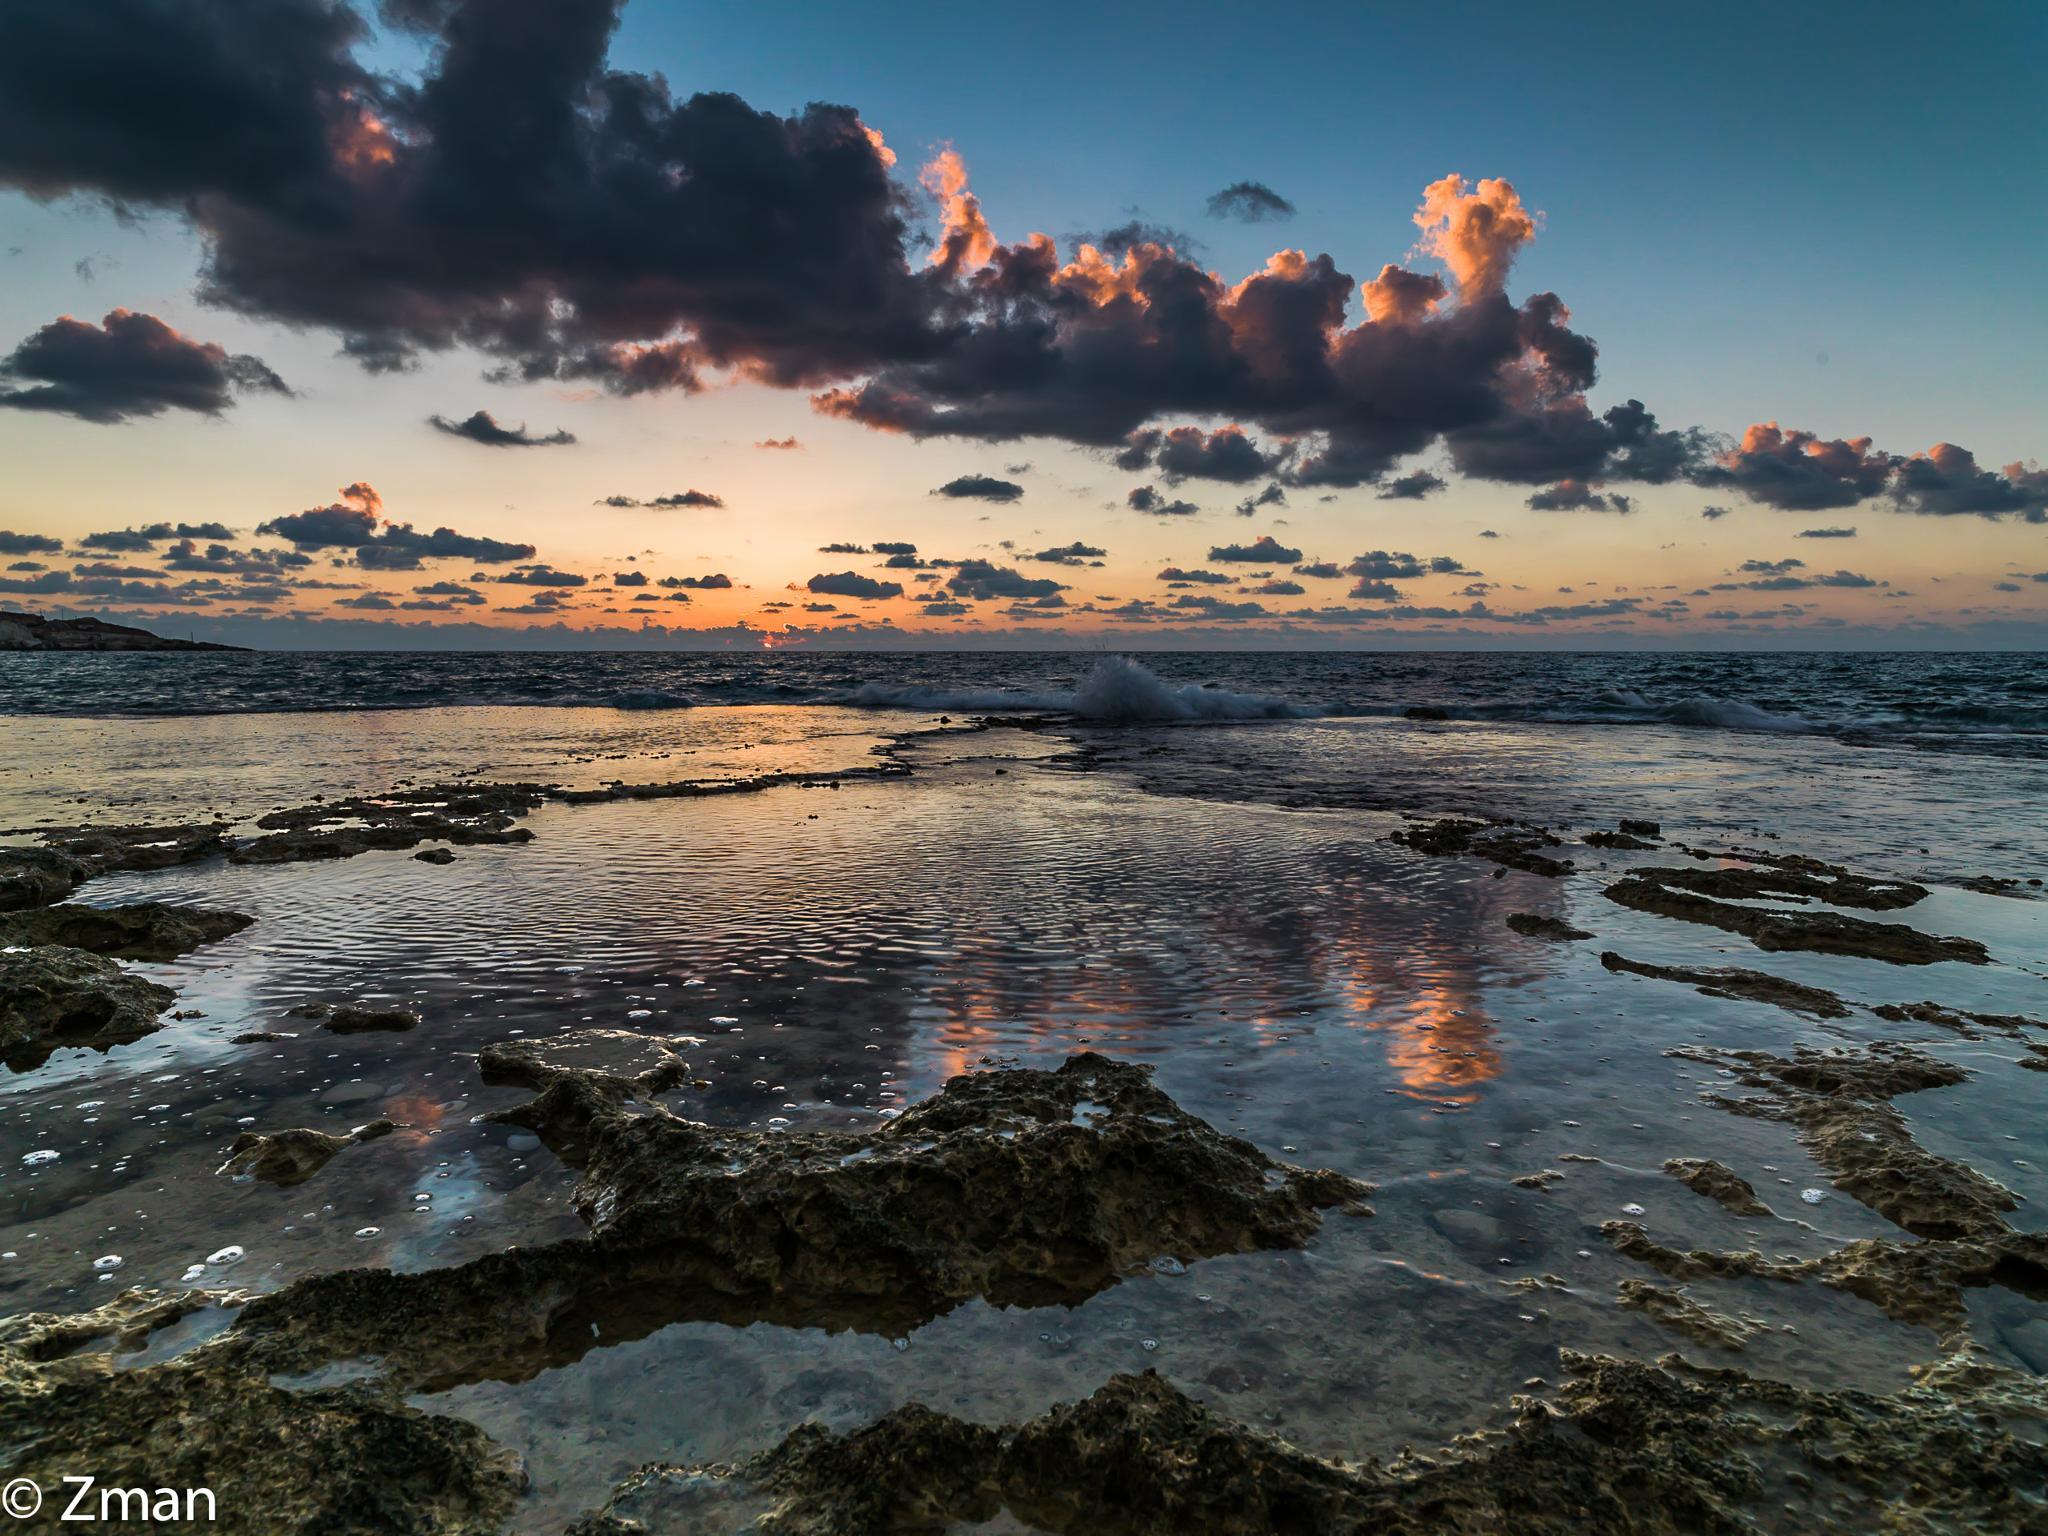 The Beach at Al Naqoura by muhammad.nasser.963